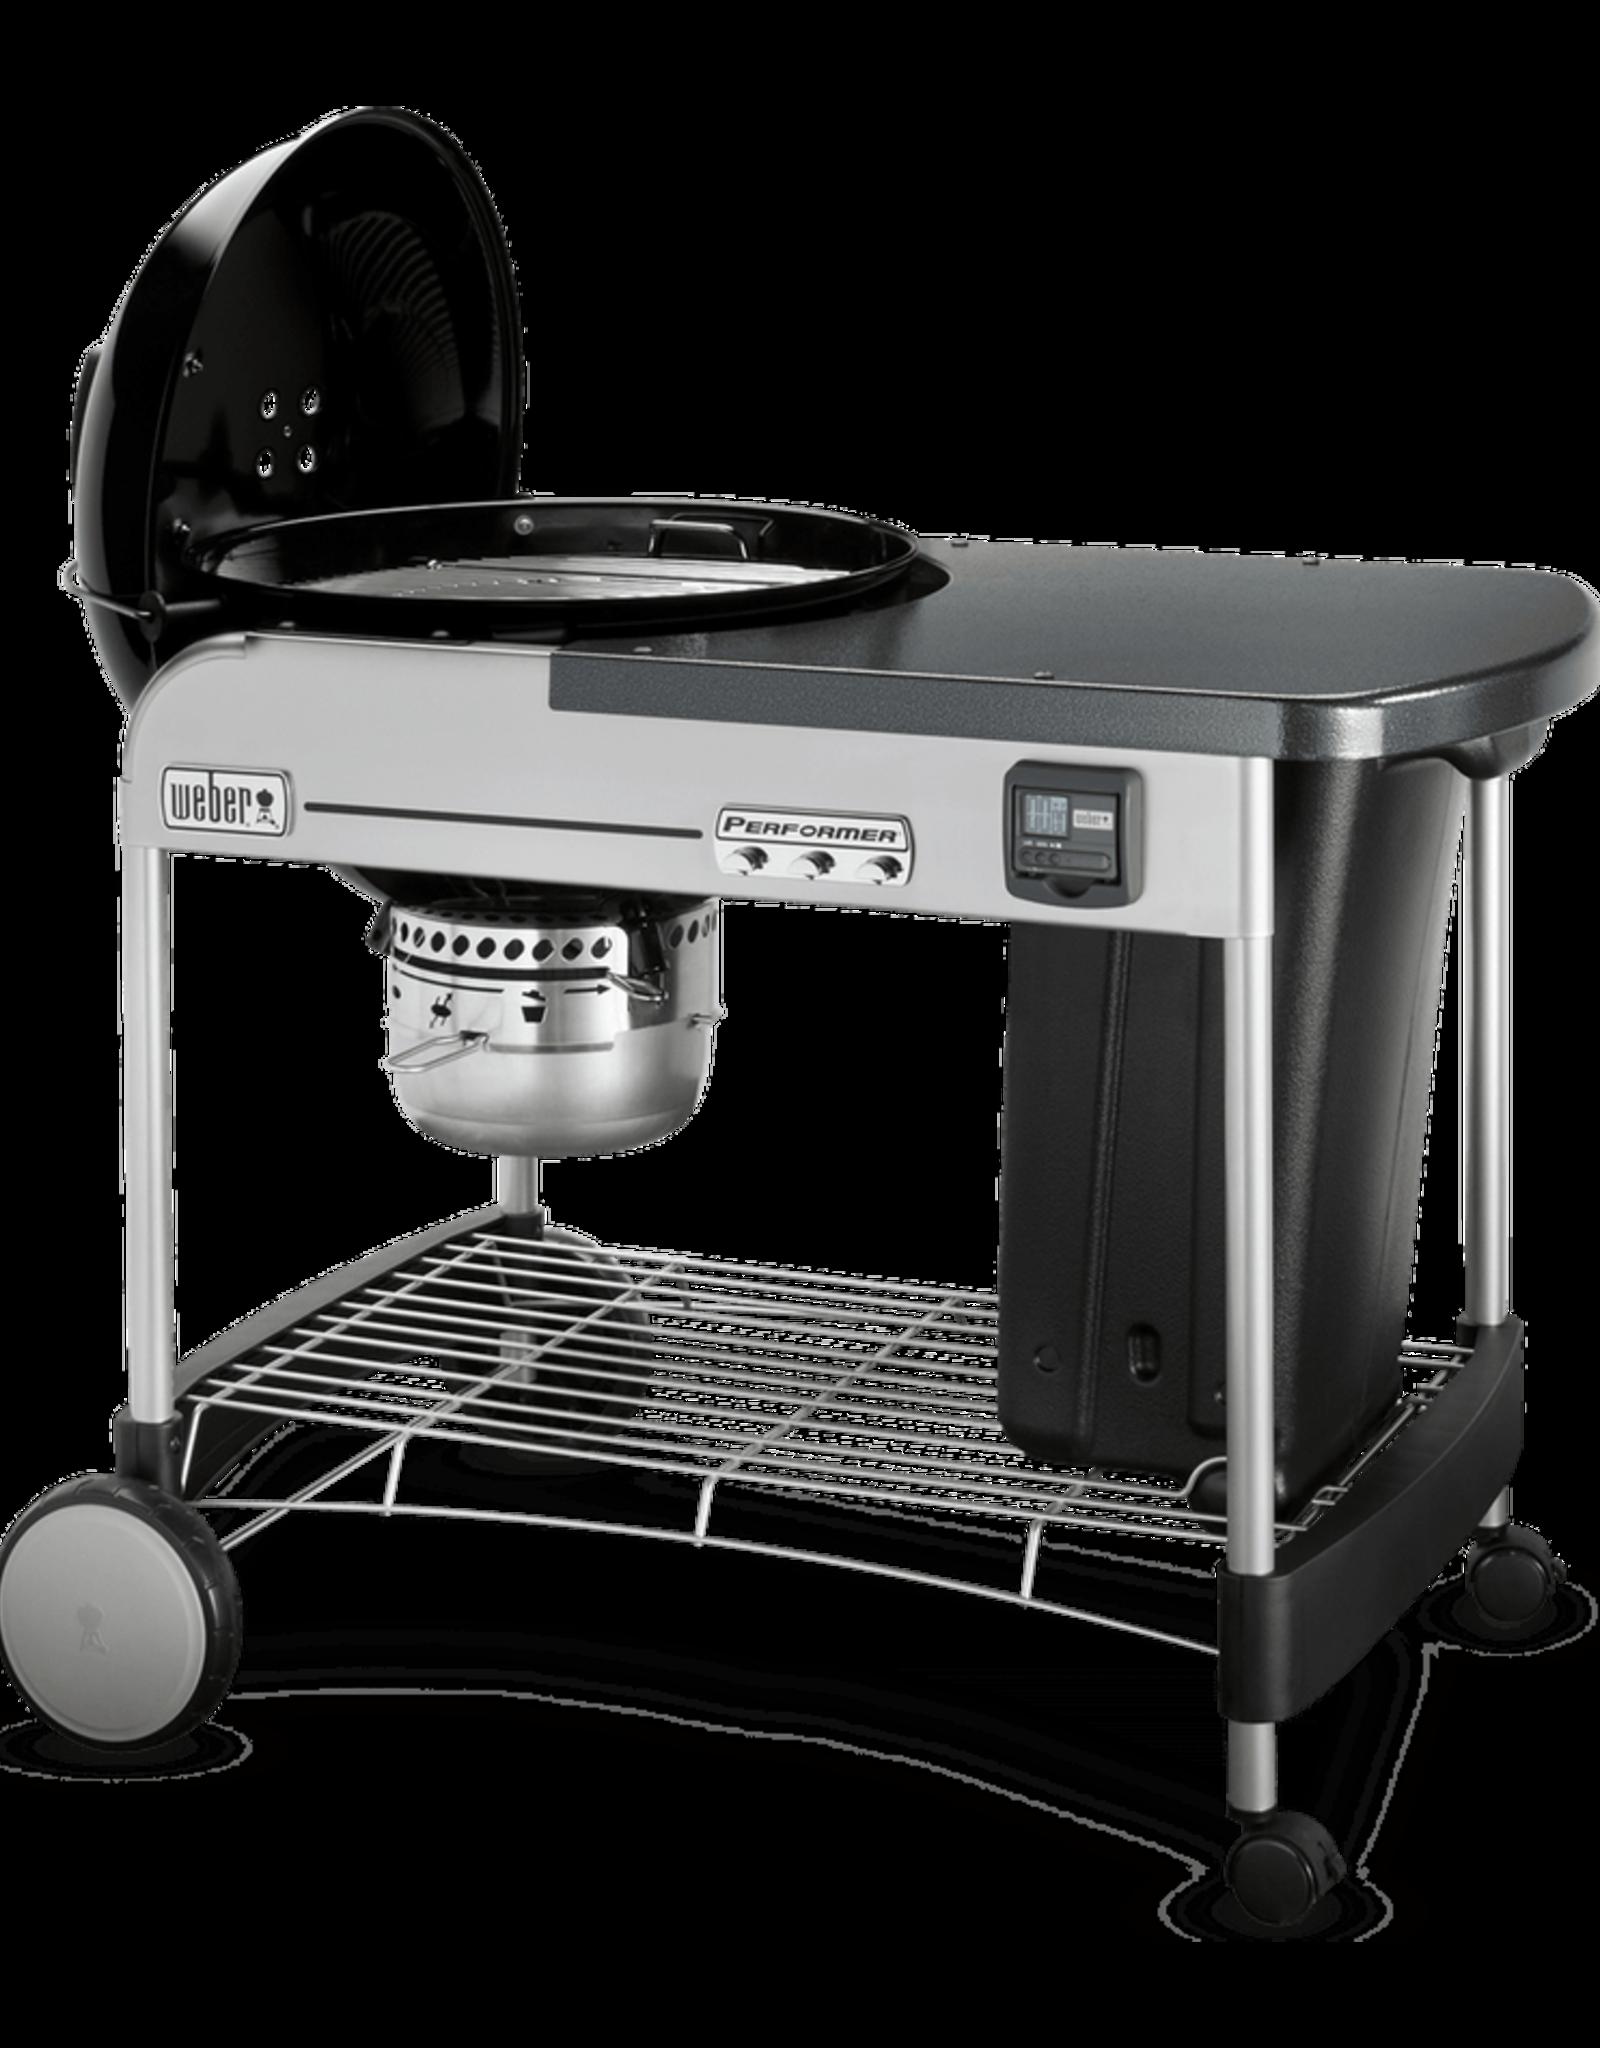 "Weber Weber Performer Premium 22"" Charcoal Grill, Black 15401001"